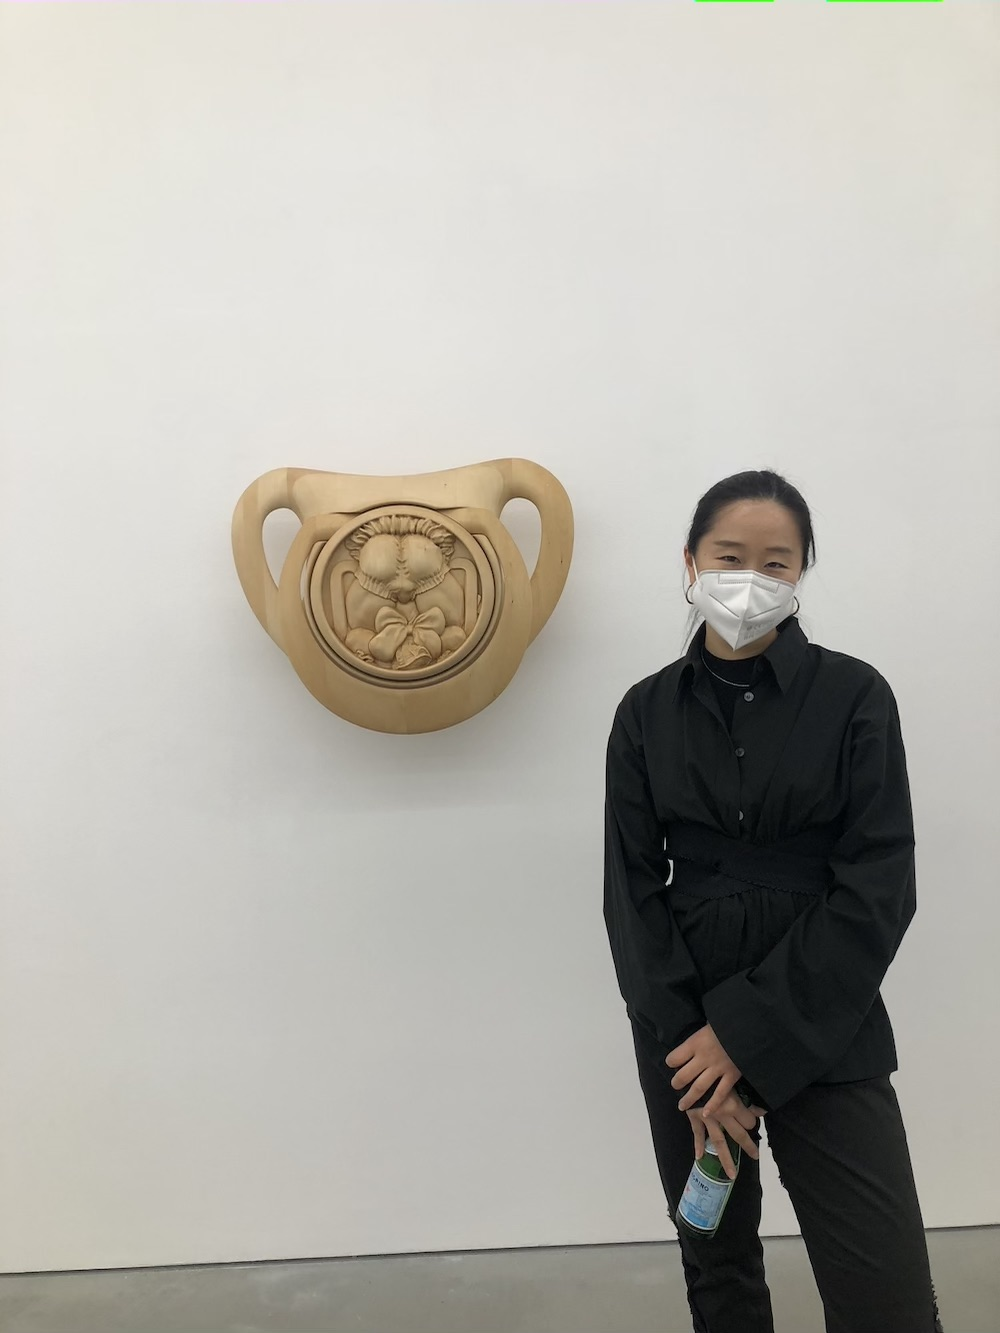 Dealer Catherine Wang at Kraupa-Tuskany Zeidler's Anna Uddenberg exhibition.